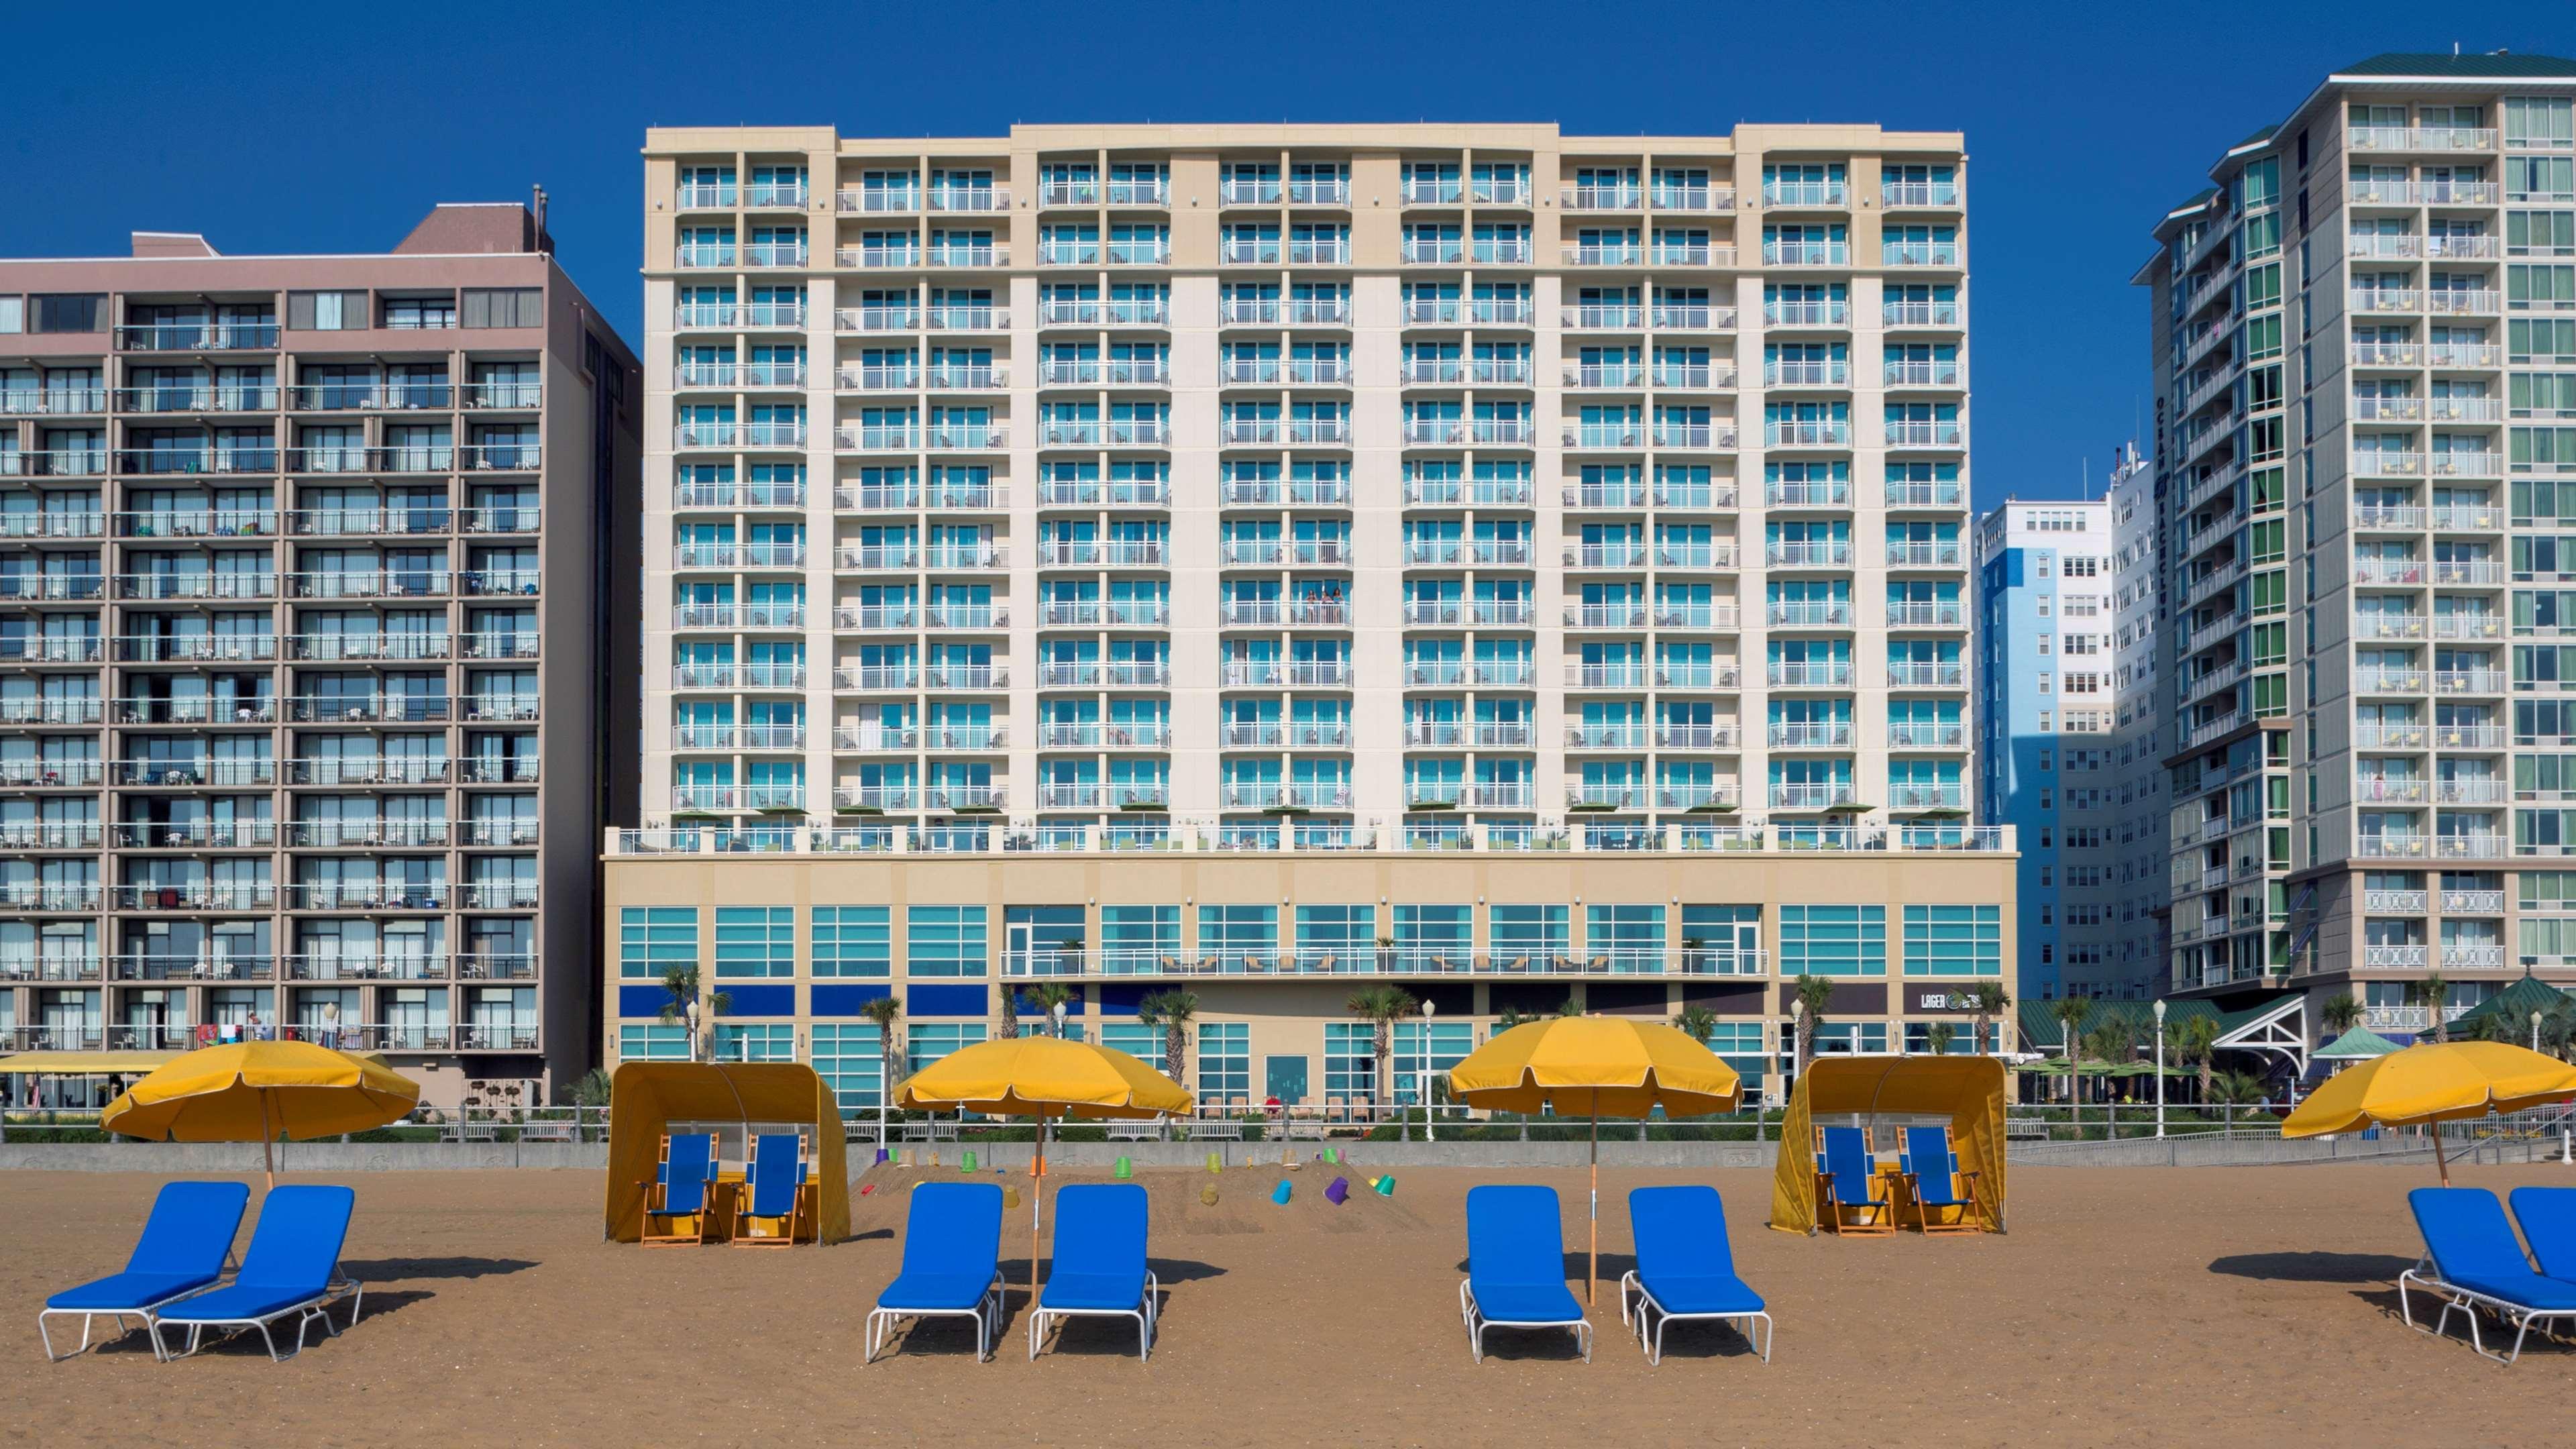 Hilton Garden Inn Virginia Beach Oceanfront image 3